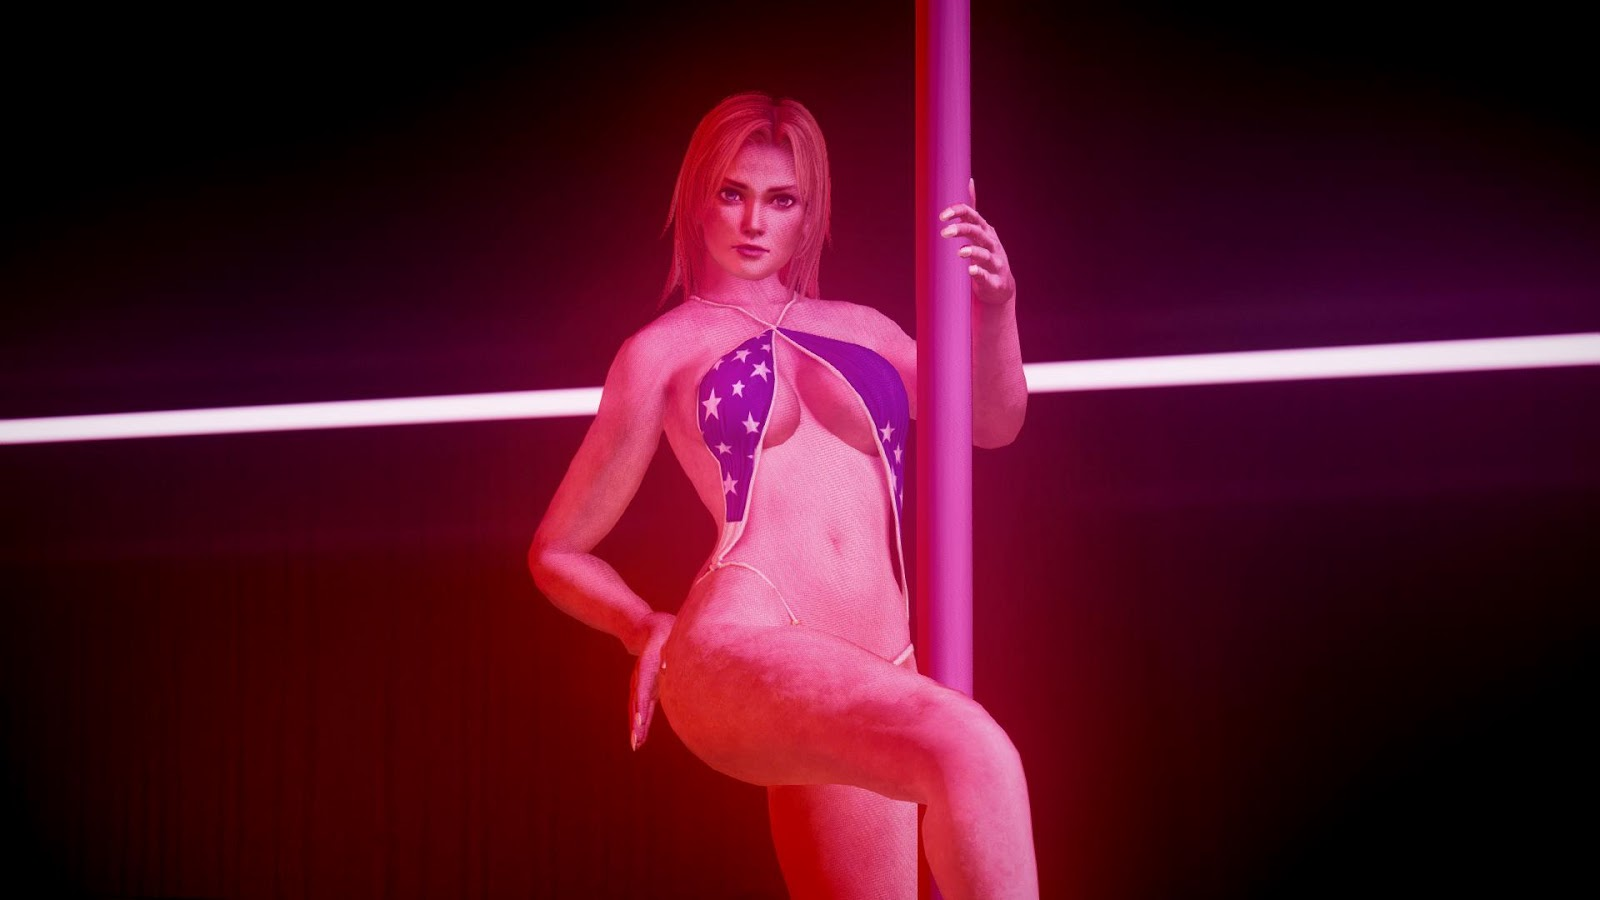 Gta 5 naked pics sex videos